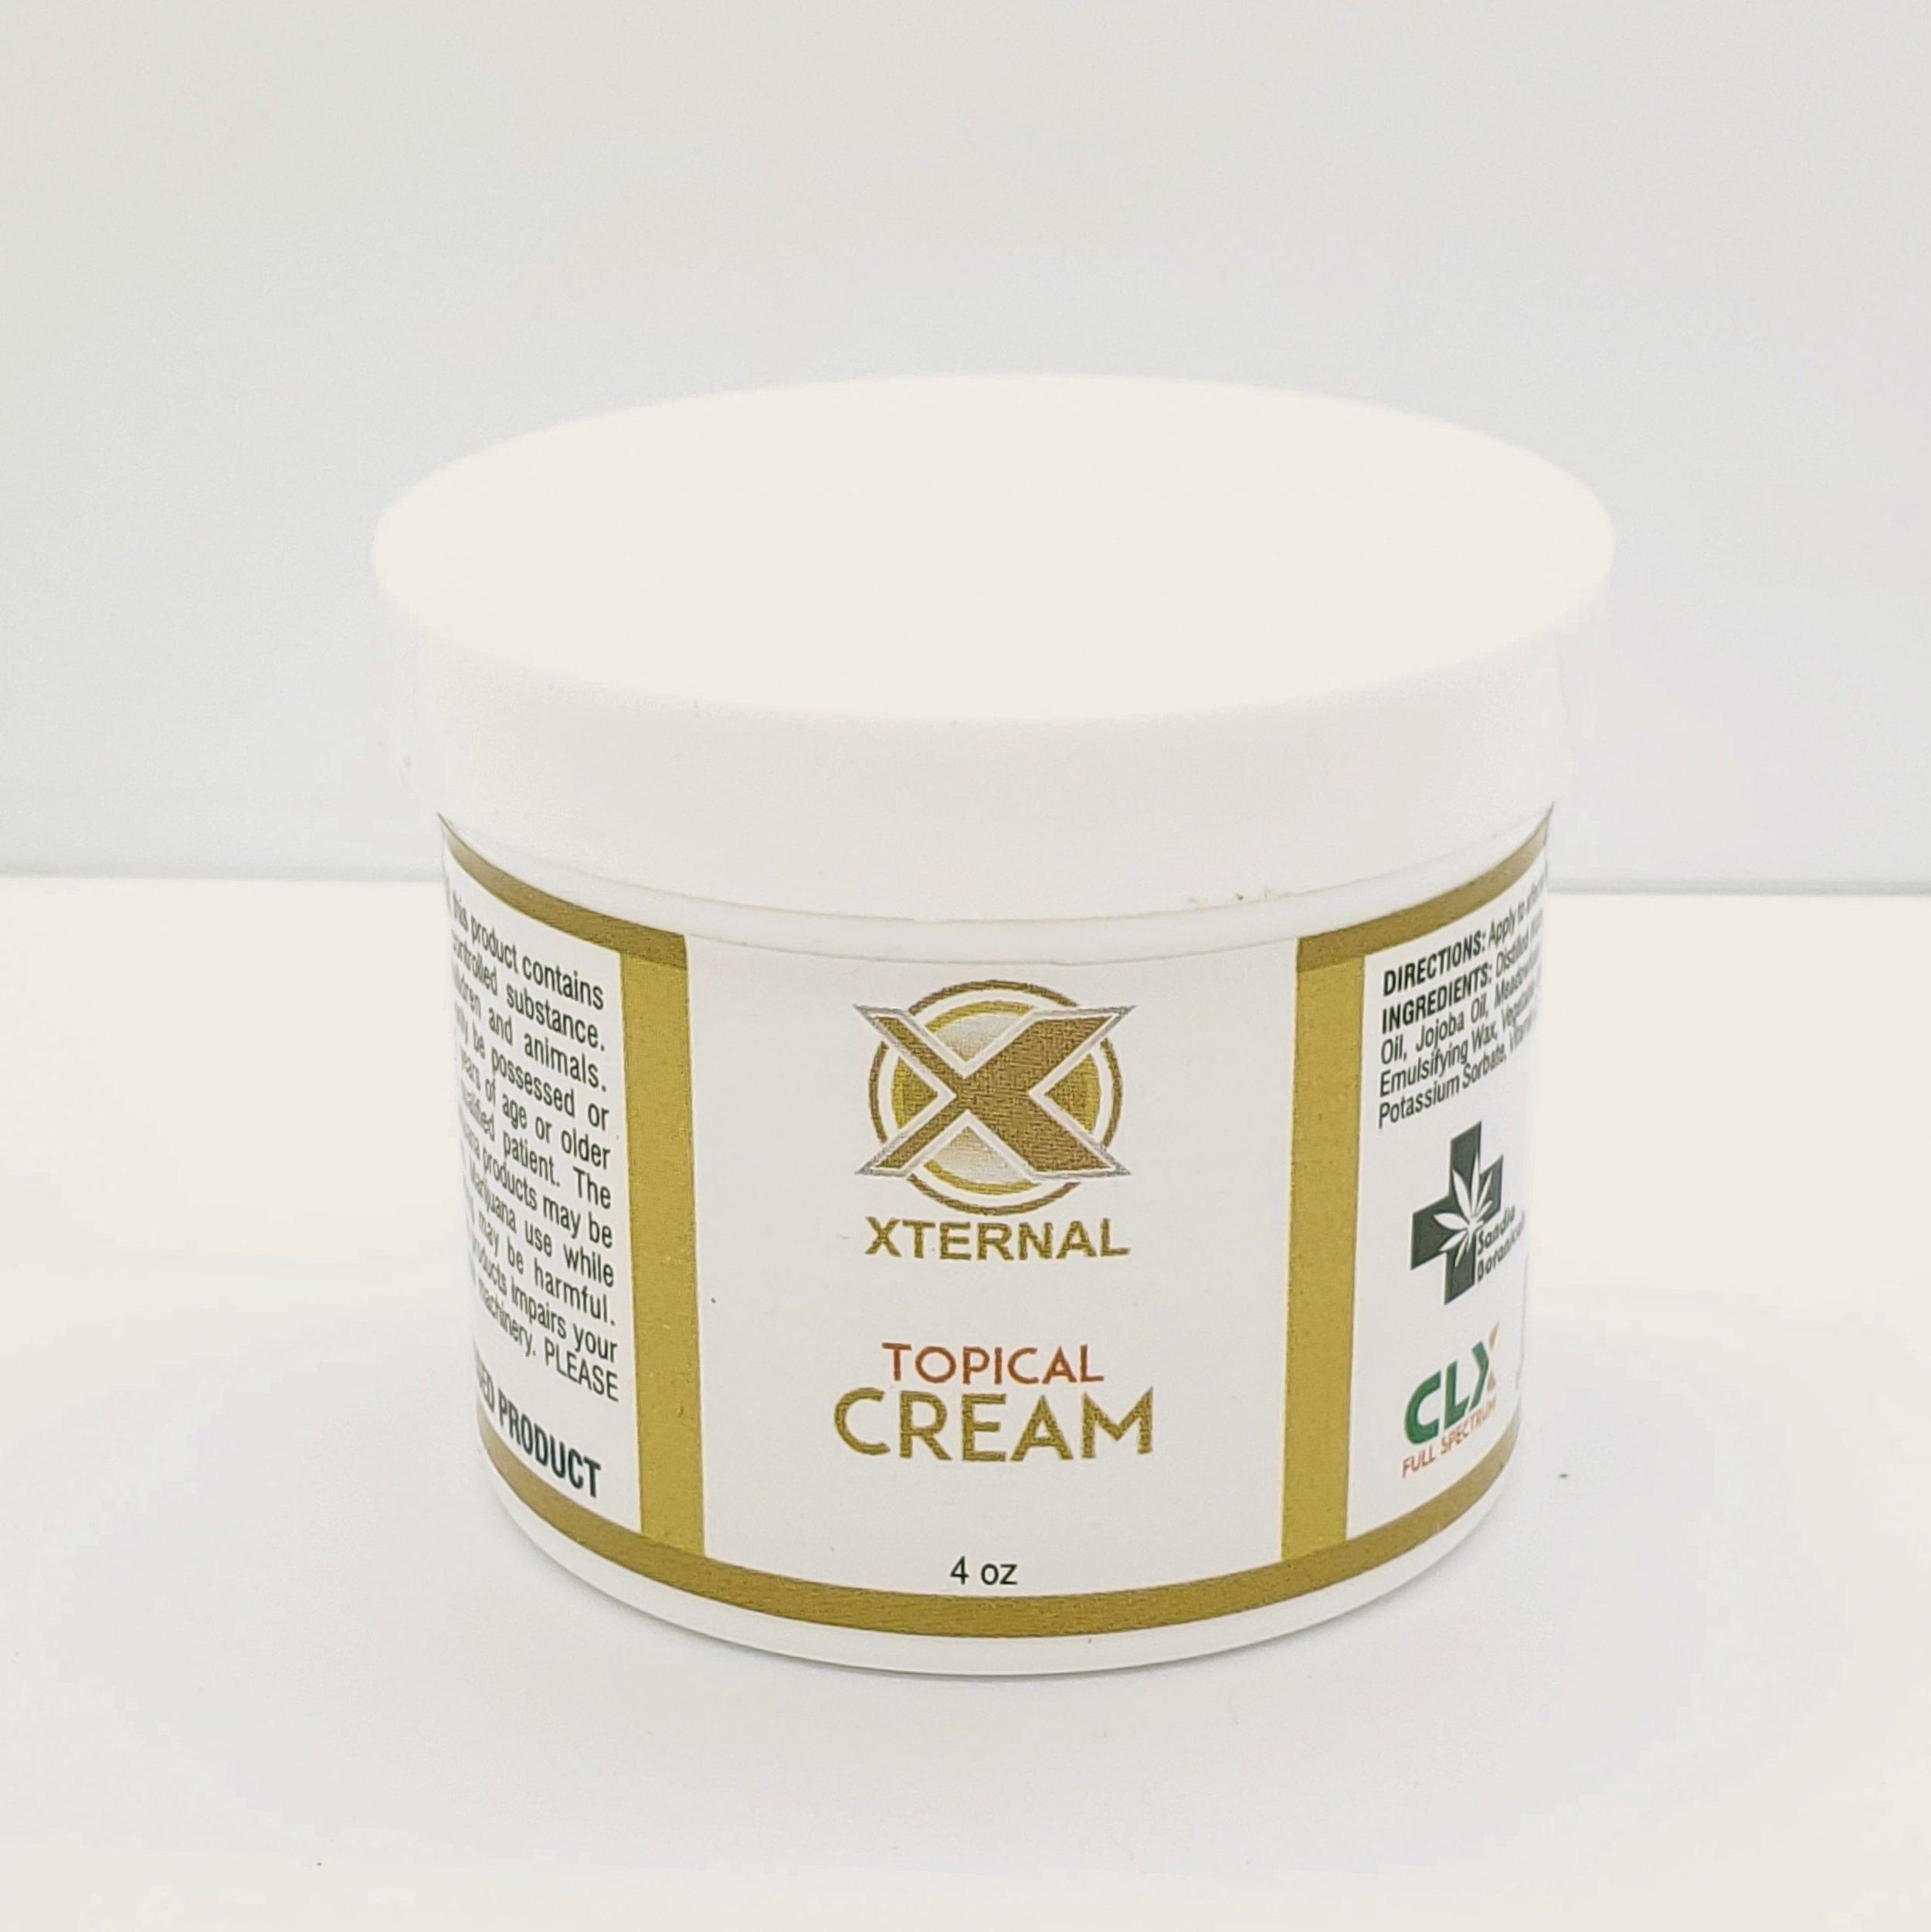 Xternal Cream 4oz